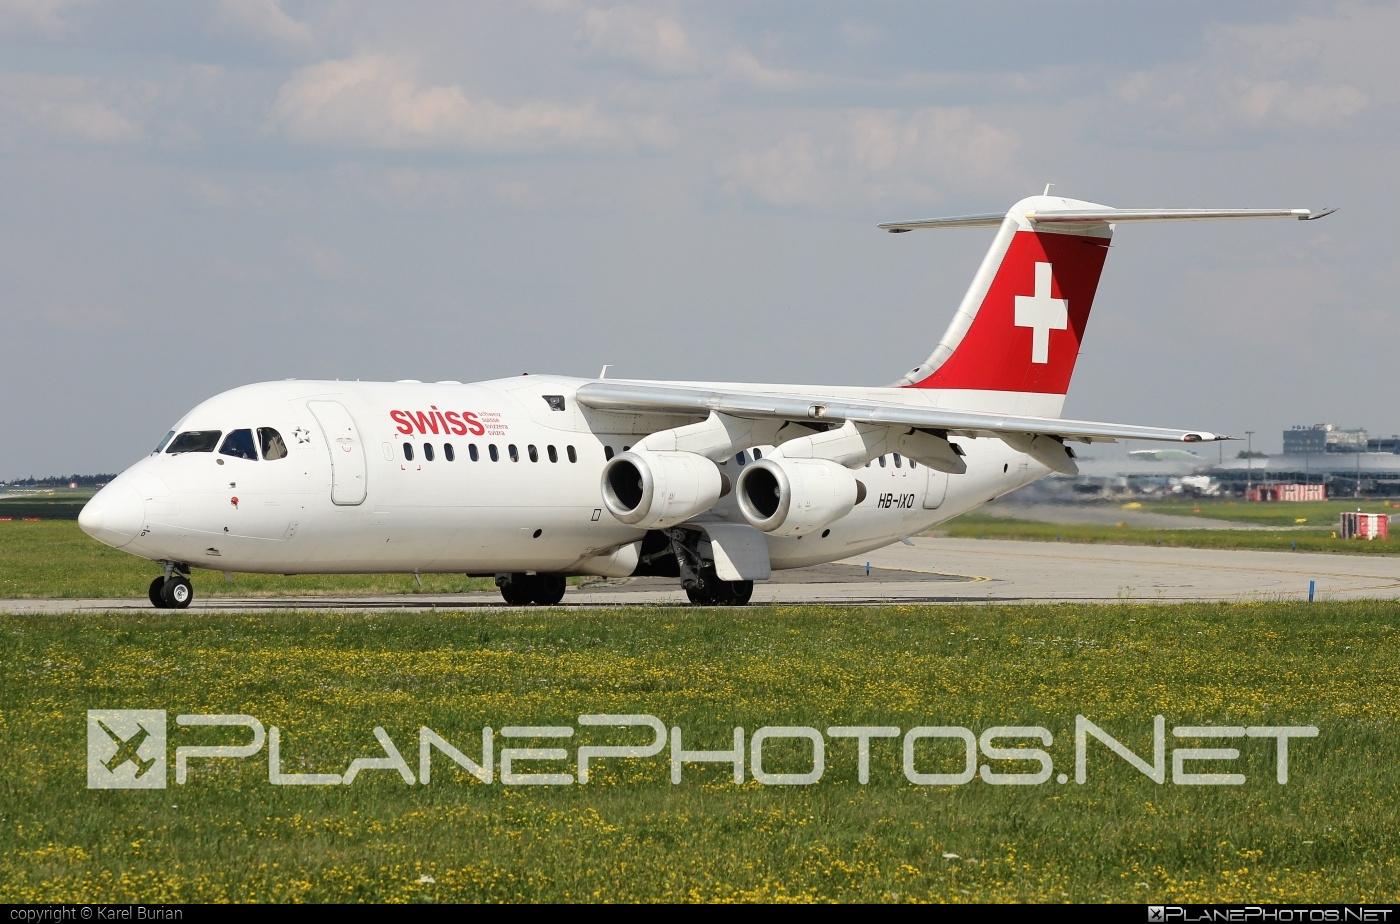 British Aerospace Avro RJ100 - HB-IXO operated by Swiss International Air Lines #avro146rj100 #avrorj100 #bae146 #britishaerospace #swiss #swissairlines